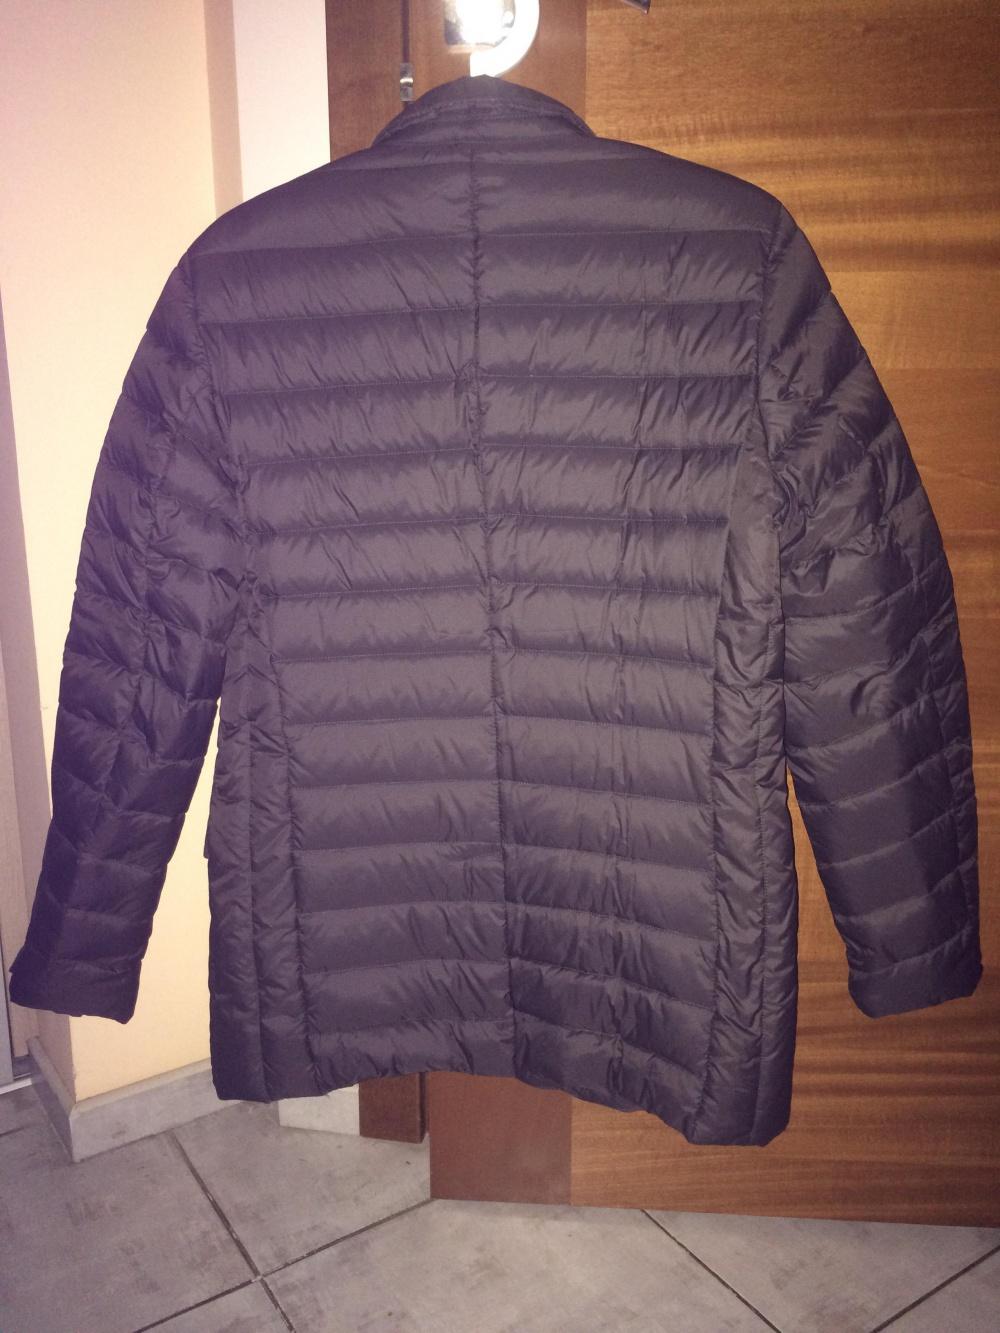 Мужской пиджак (куртка)на пуху. Размер L .